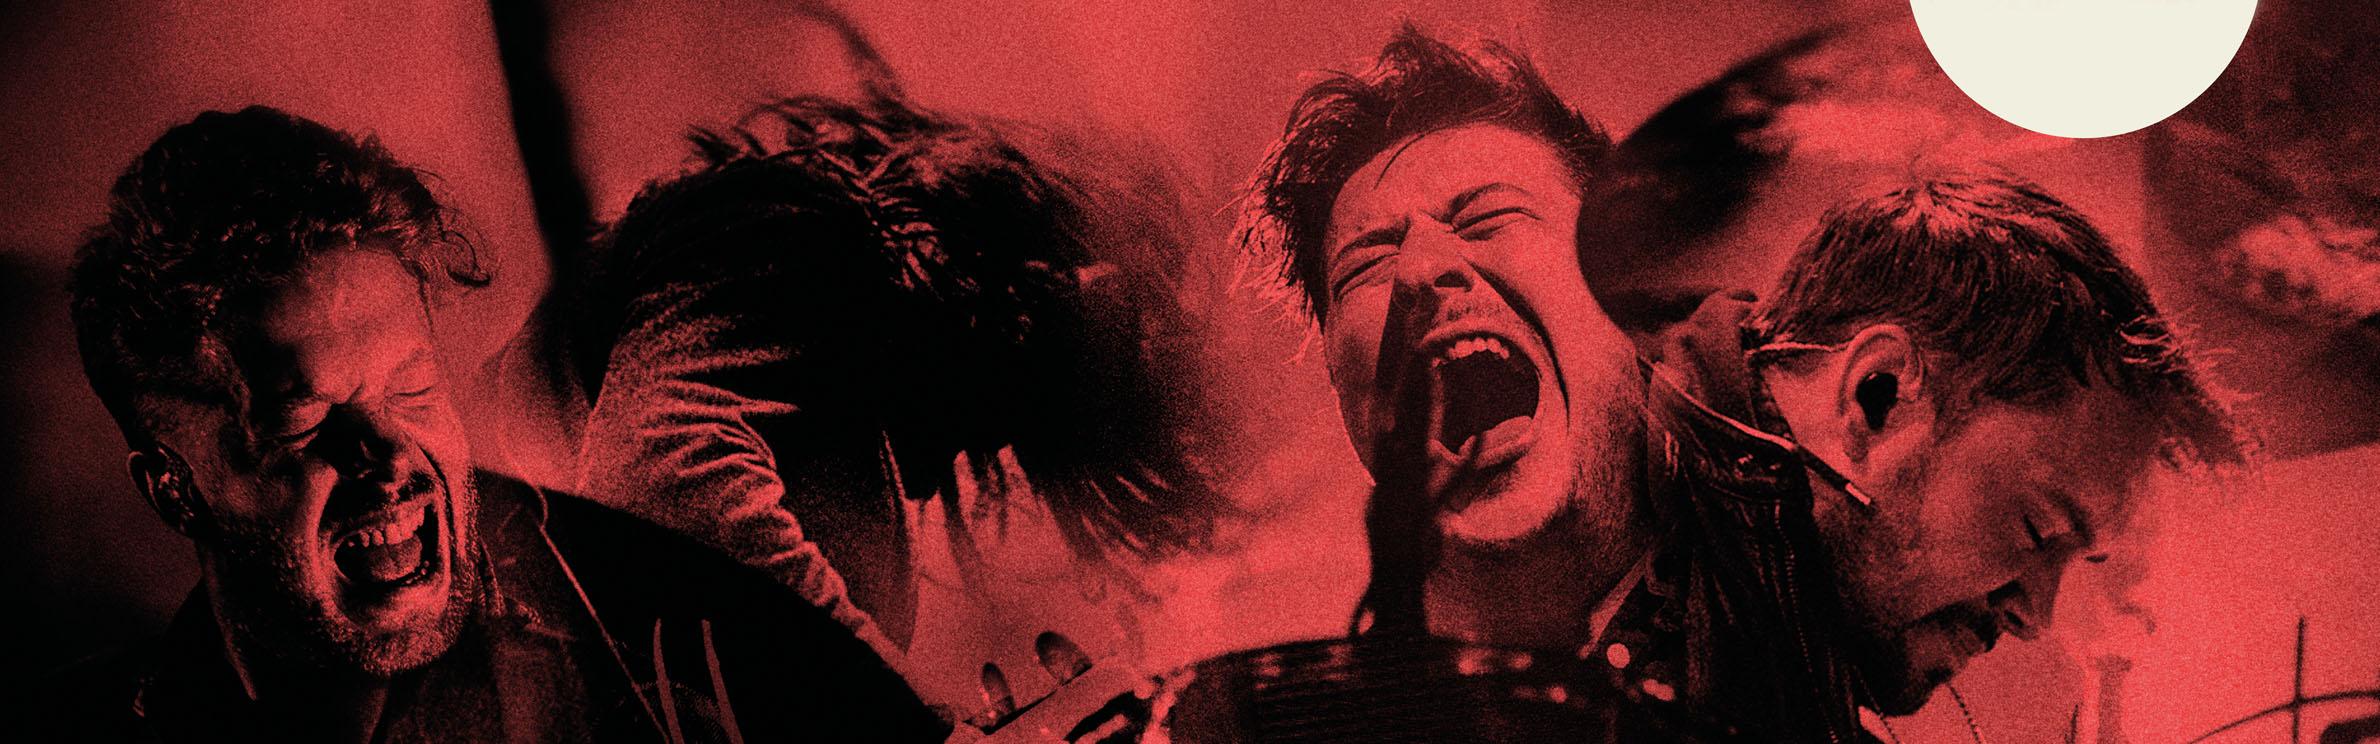 mumford-sons-live-copy